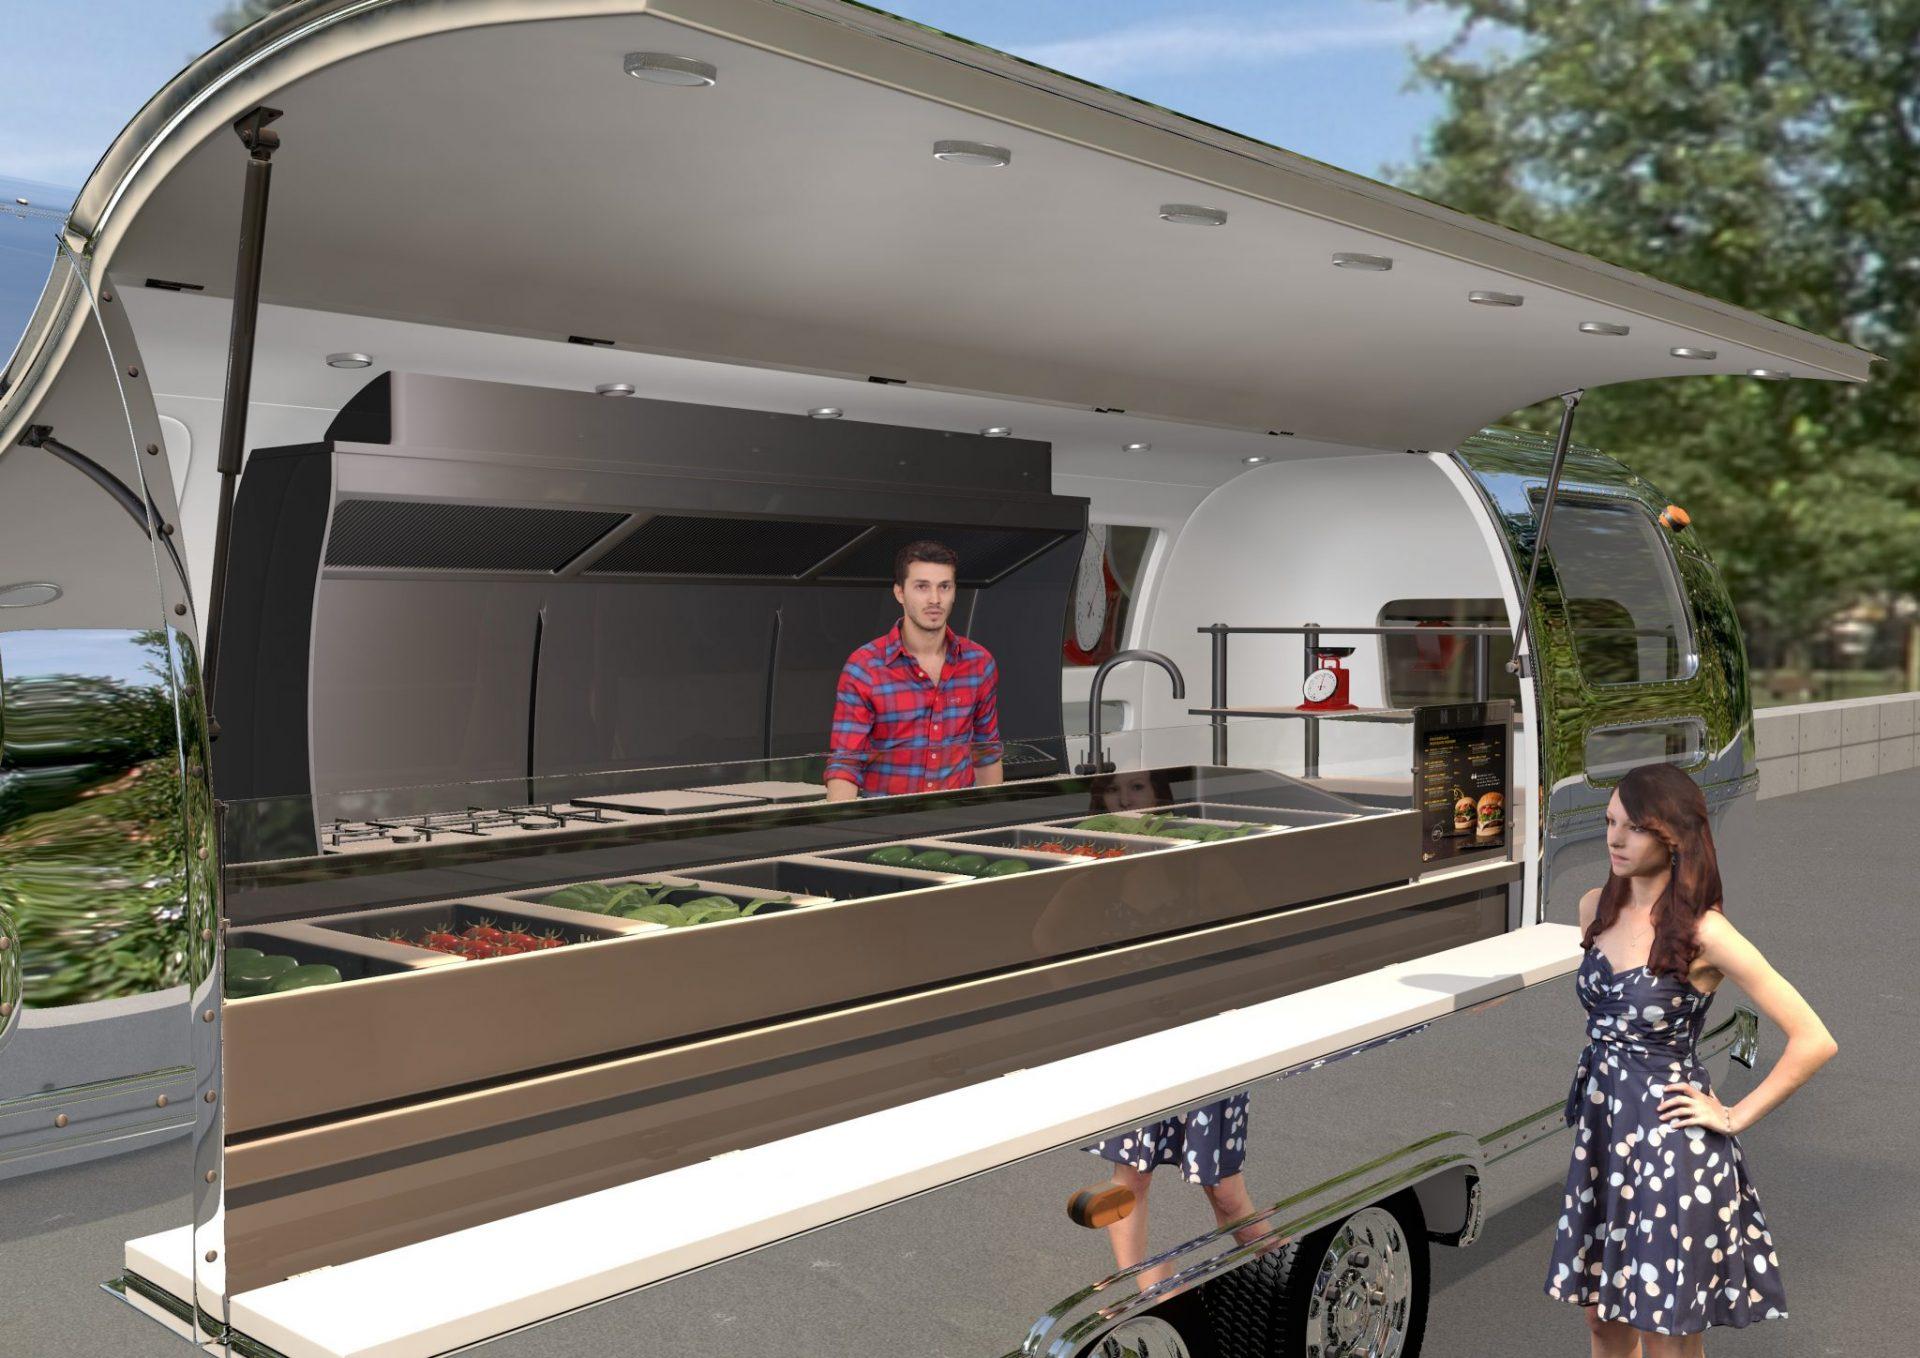 Airstream-Foodtrailer-Foodtruck-Gastro-Focus-Klappe